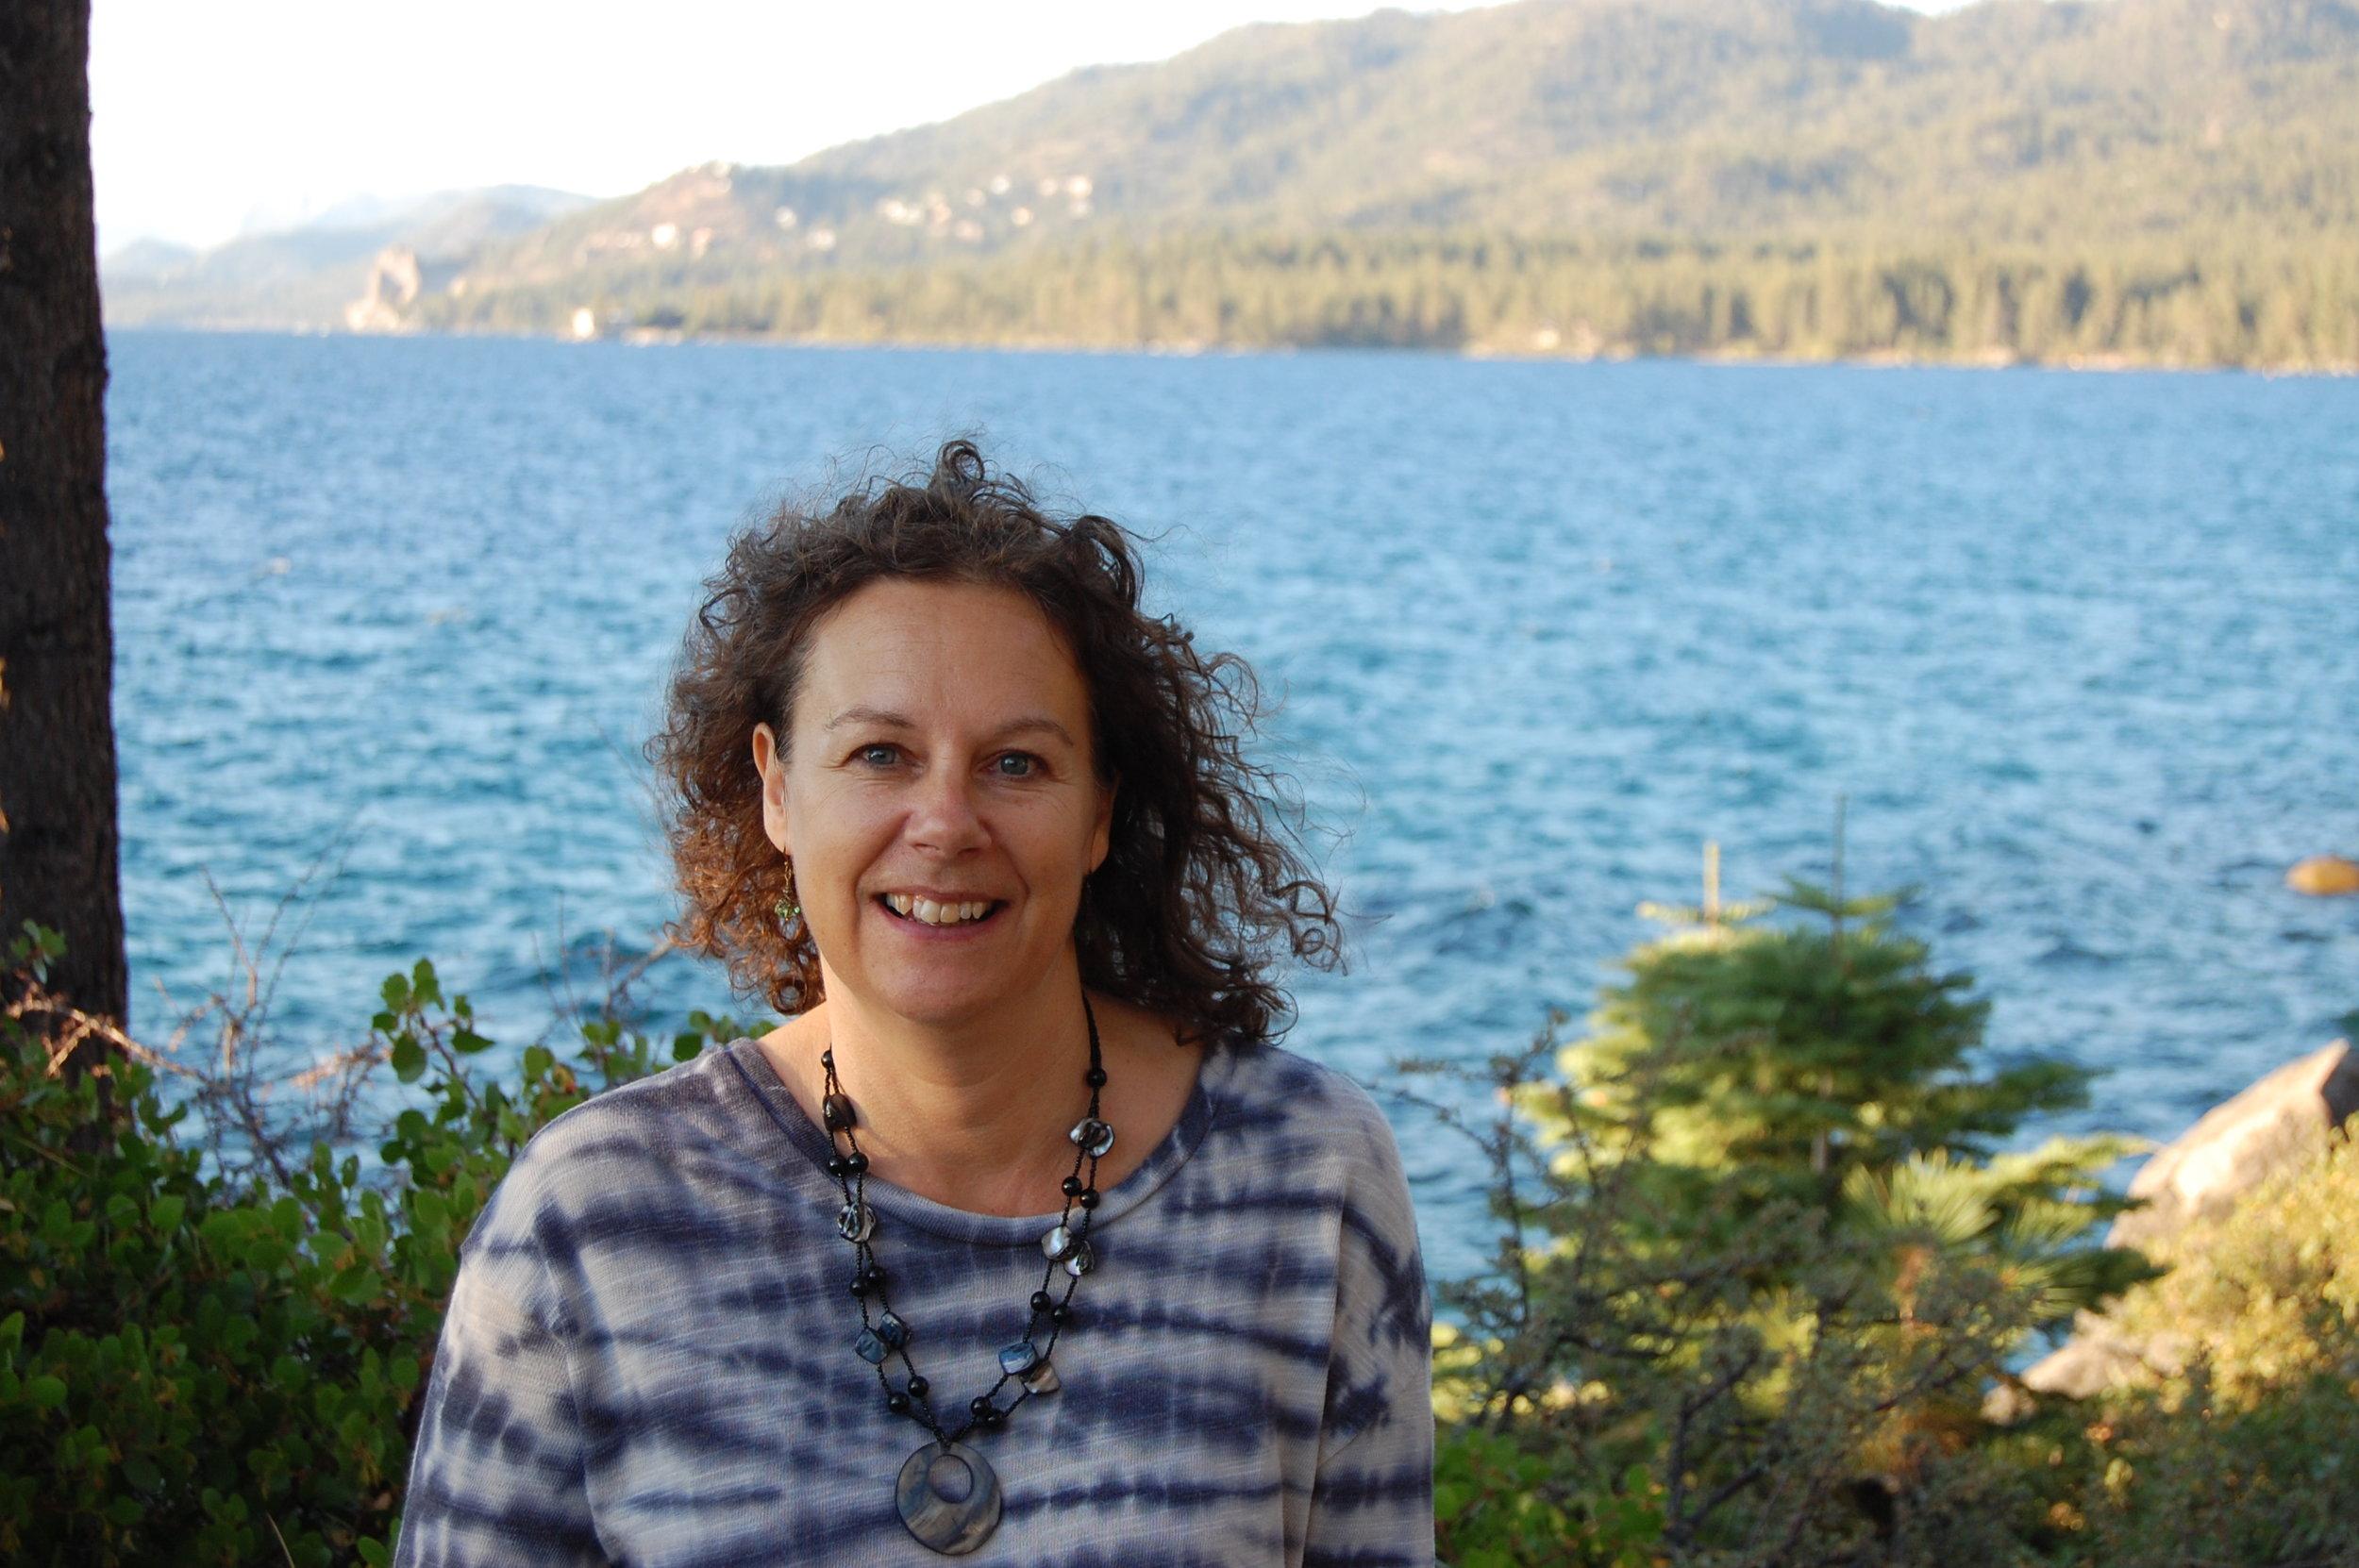 Enjoying the beauty of Lake Tahoe